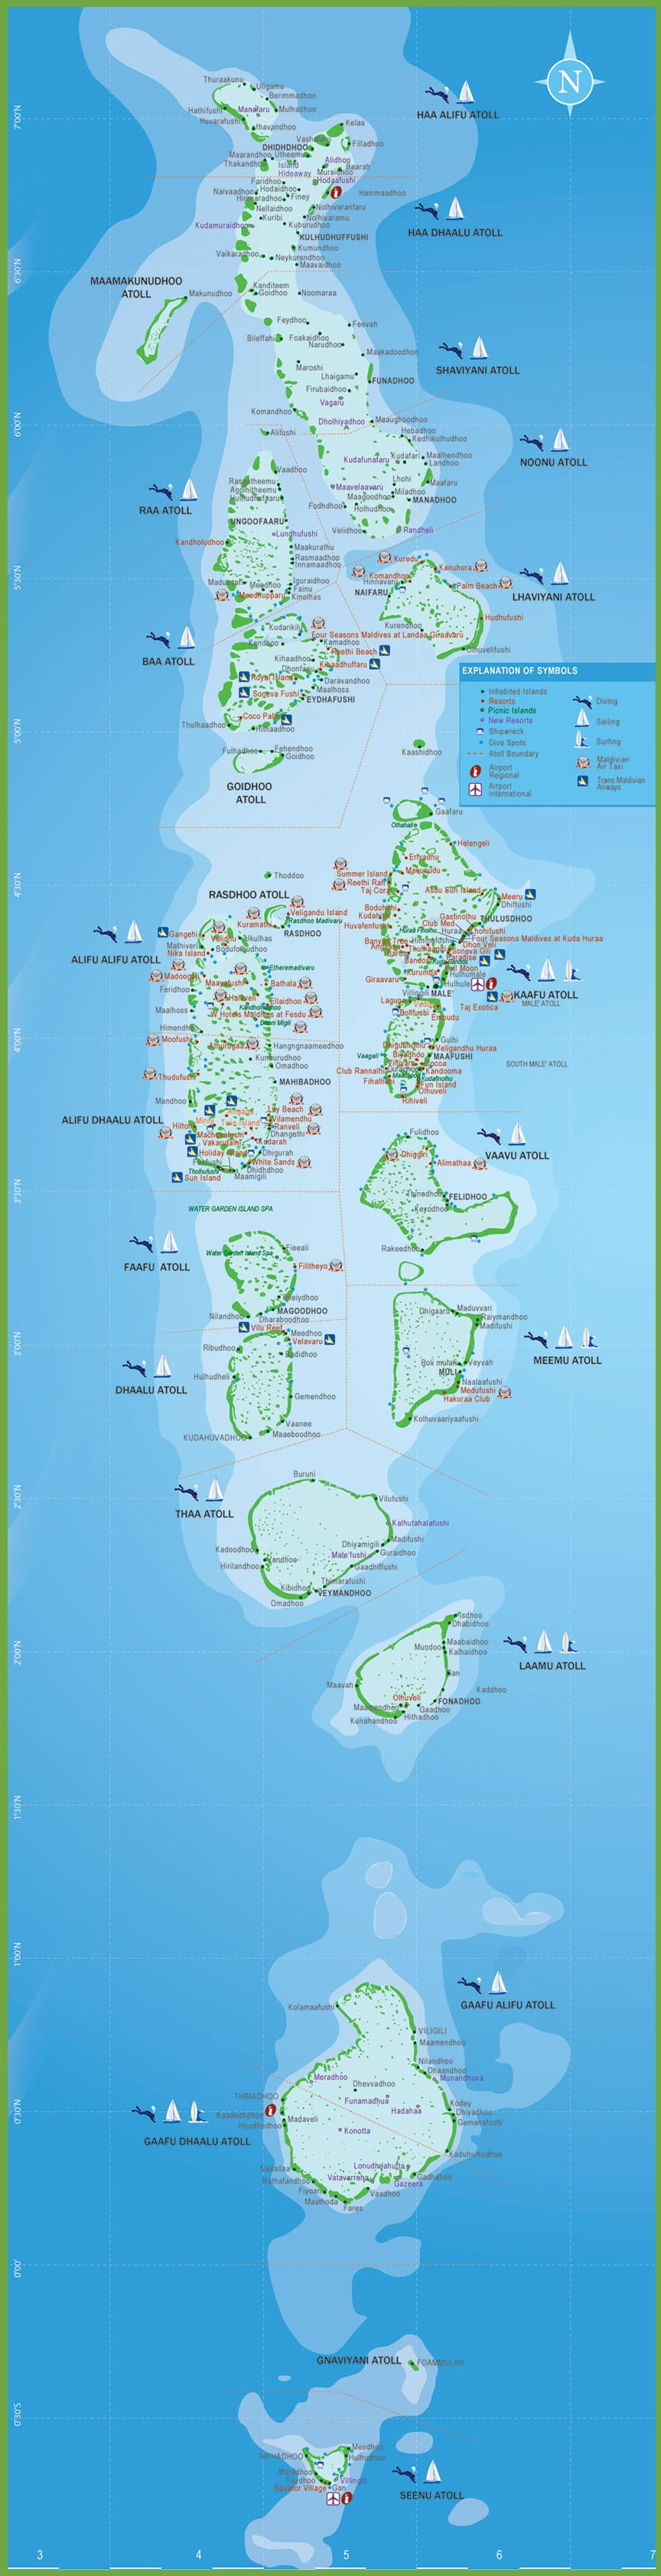 Maldives Hotel Map Maldives hotel a...